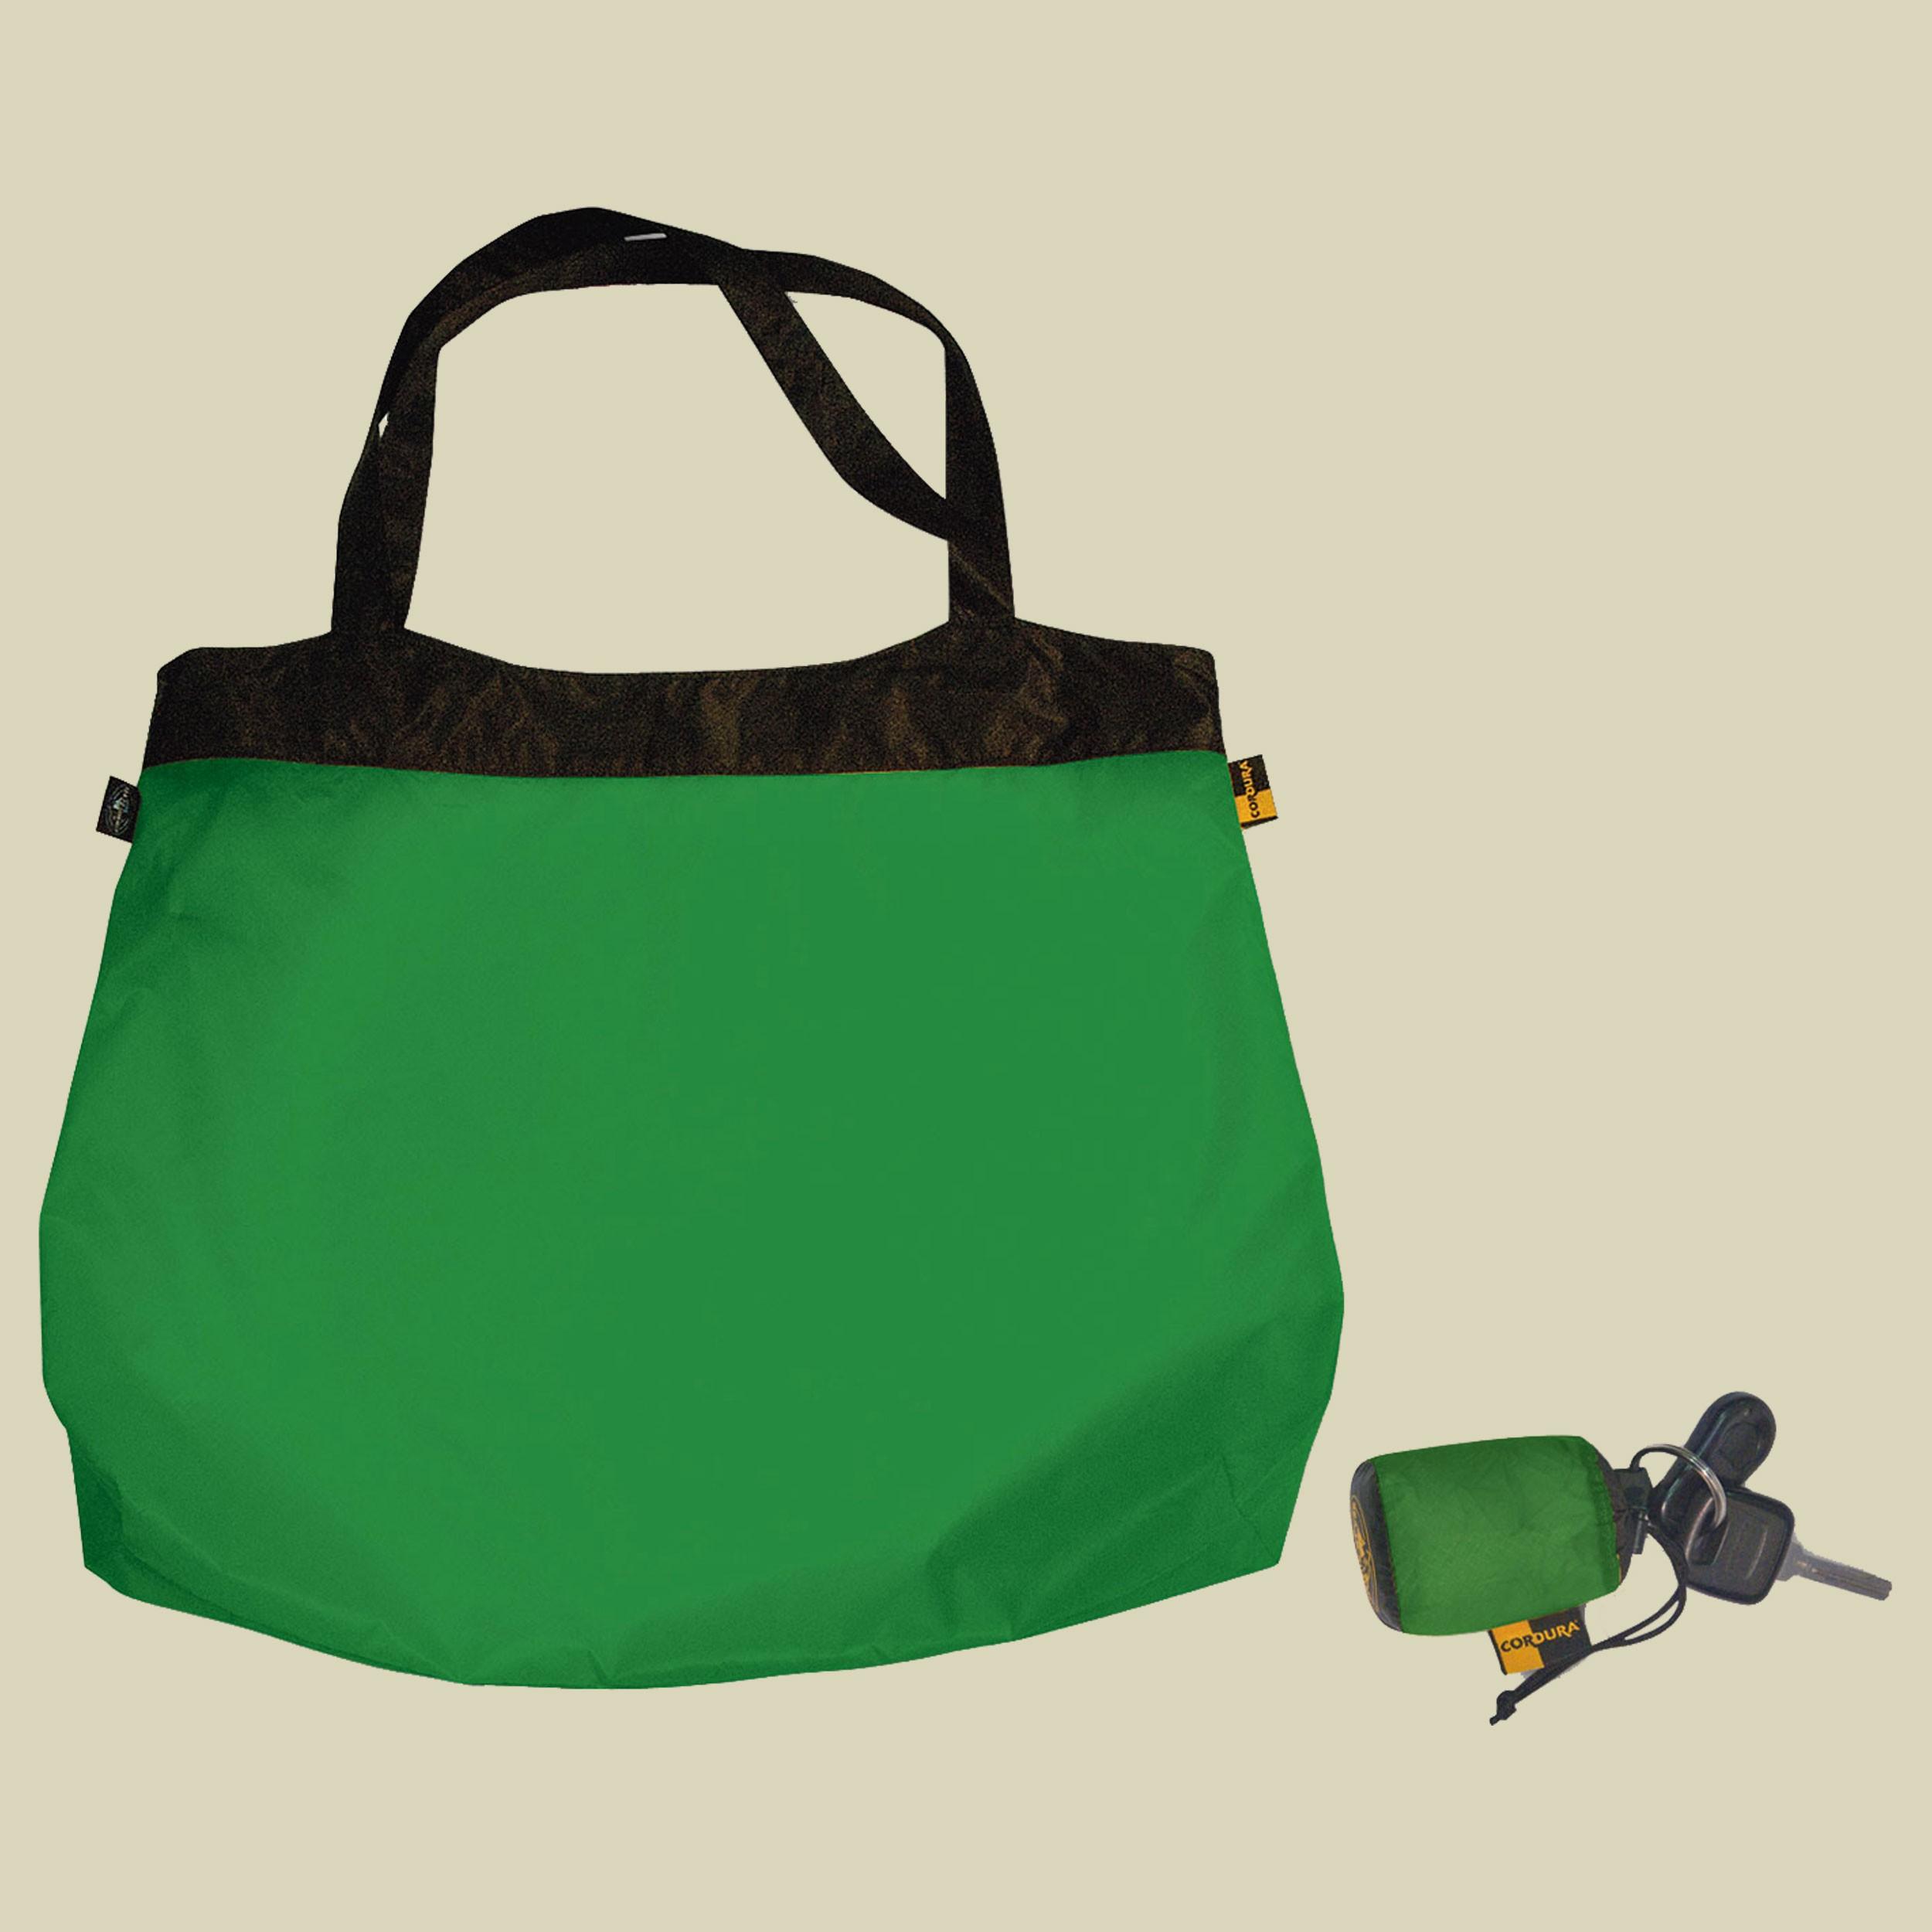 Ultra-Sil Shopping Bag